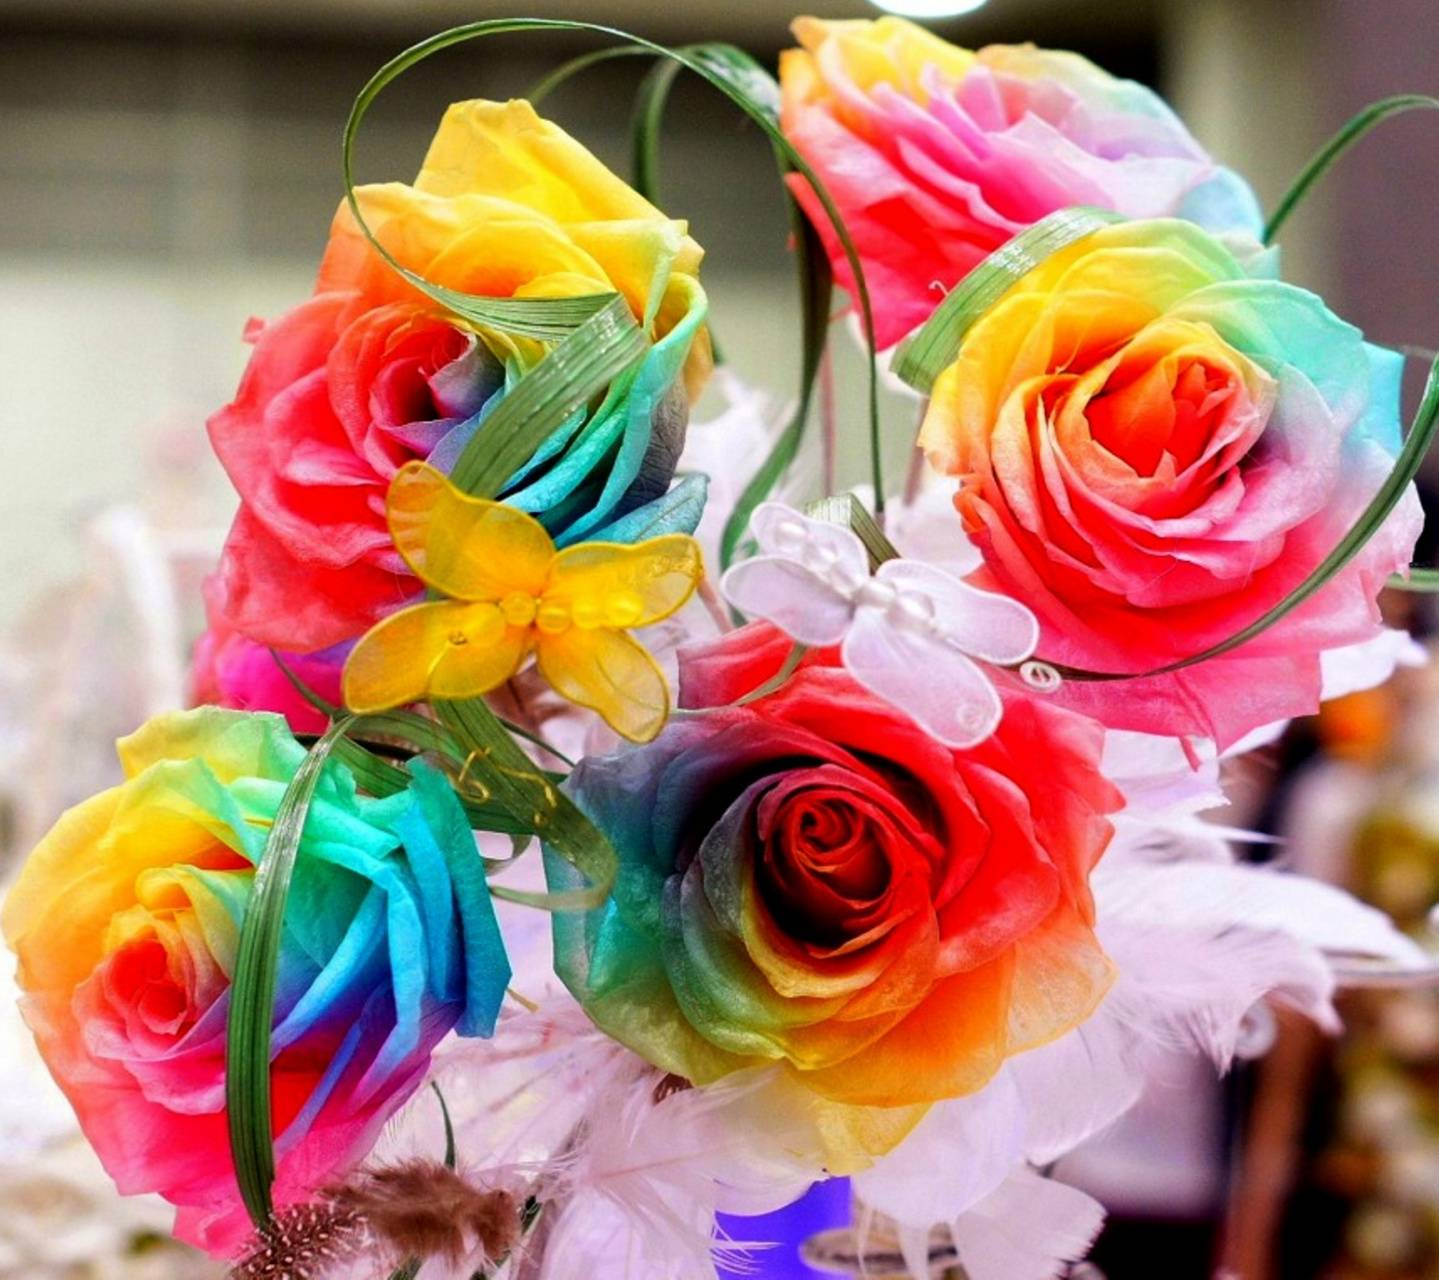 Rainbow Delicacies